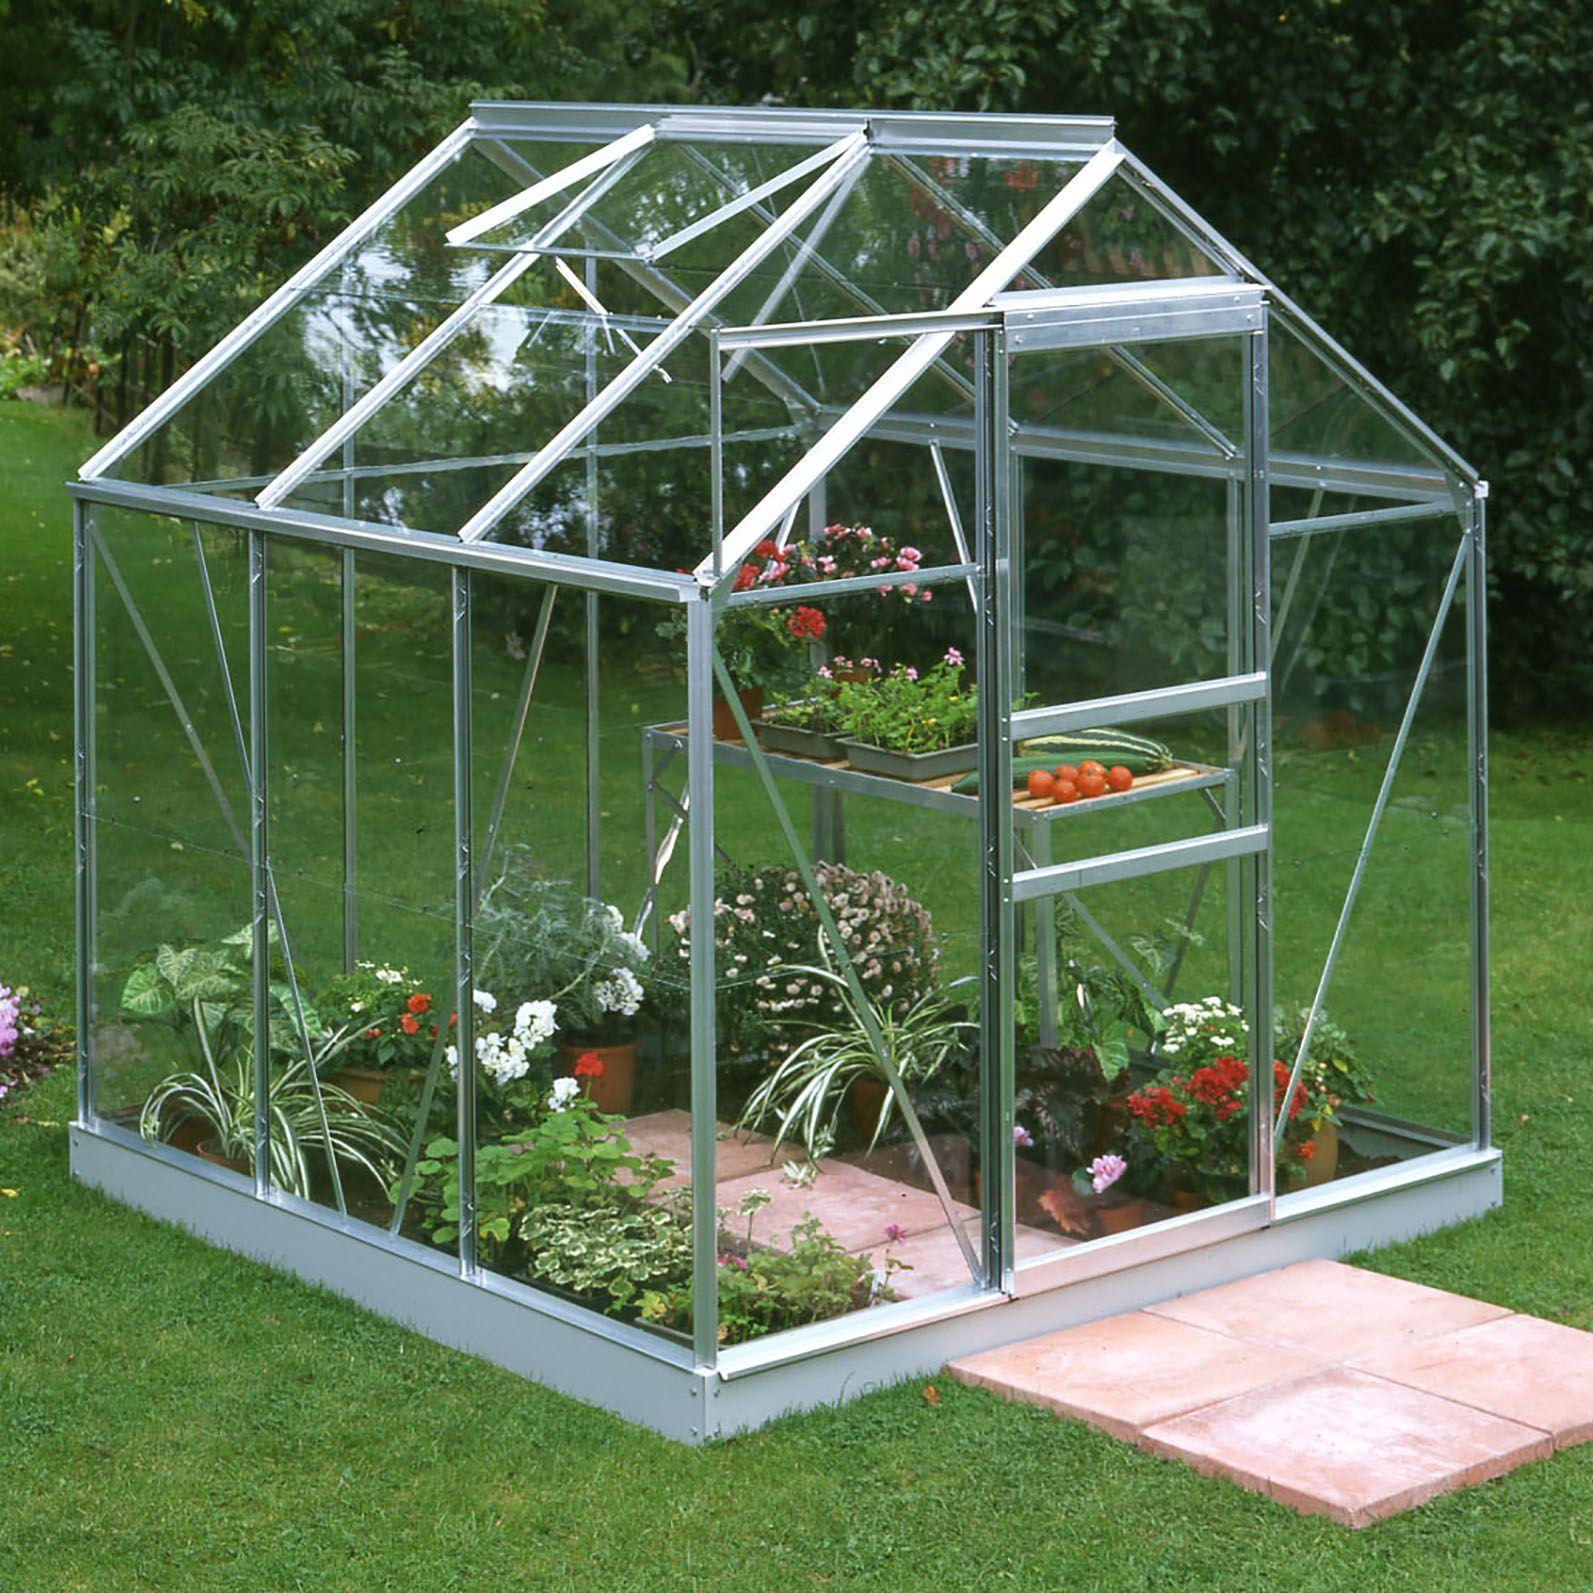 B Amp Q Metal 6x6 Horticultural Glass Greenhouse Departments